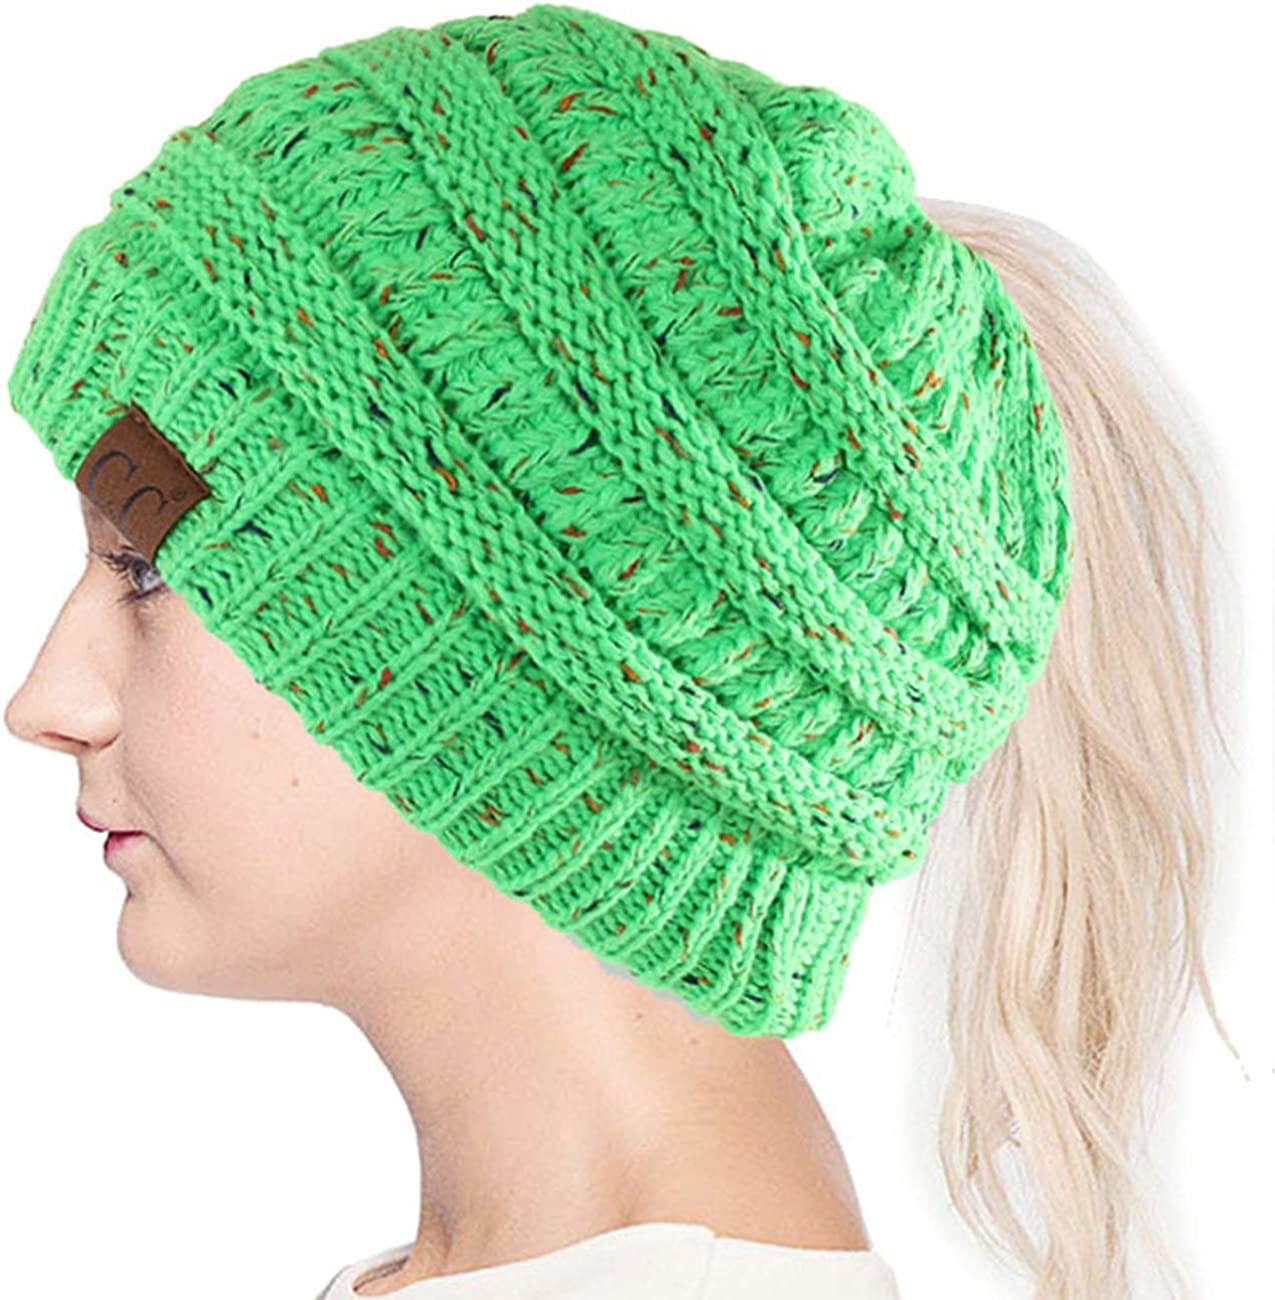 ScarvesMe Women Confetti BeanieTail Ponytail Messy Bun Solid Ribbed Beanie Hat Cap